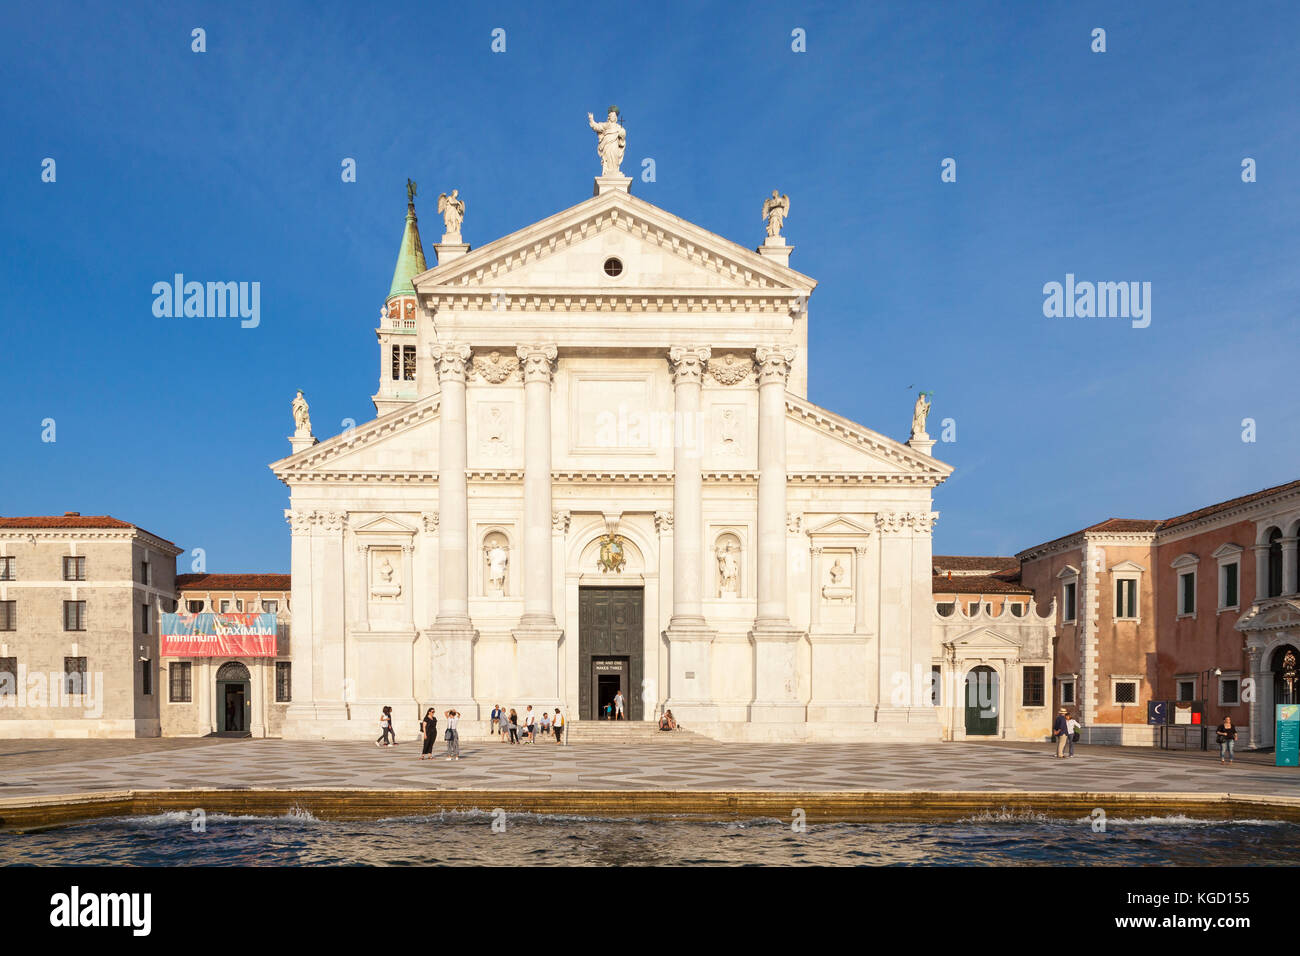 Fassade der Kirche San Giorgio Maggiore von Palladio auf Isola San Giorgio Maggiore, Venedig, Italien, bei Sonnenuntergang. Touristen in den Vorplatz Stockfoto